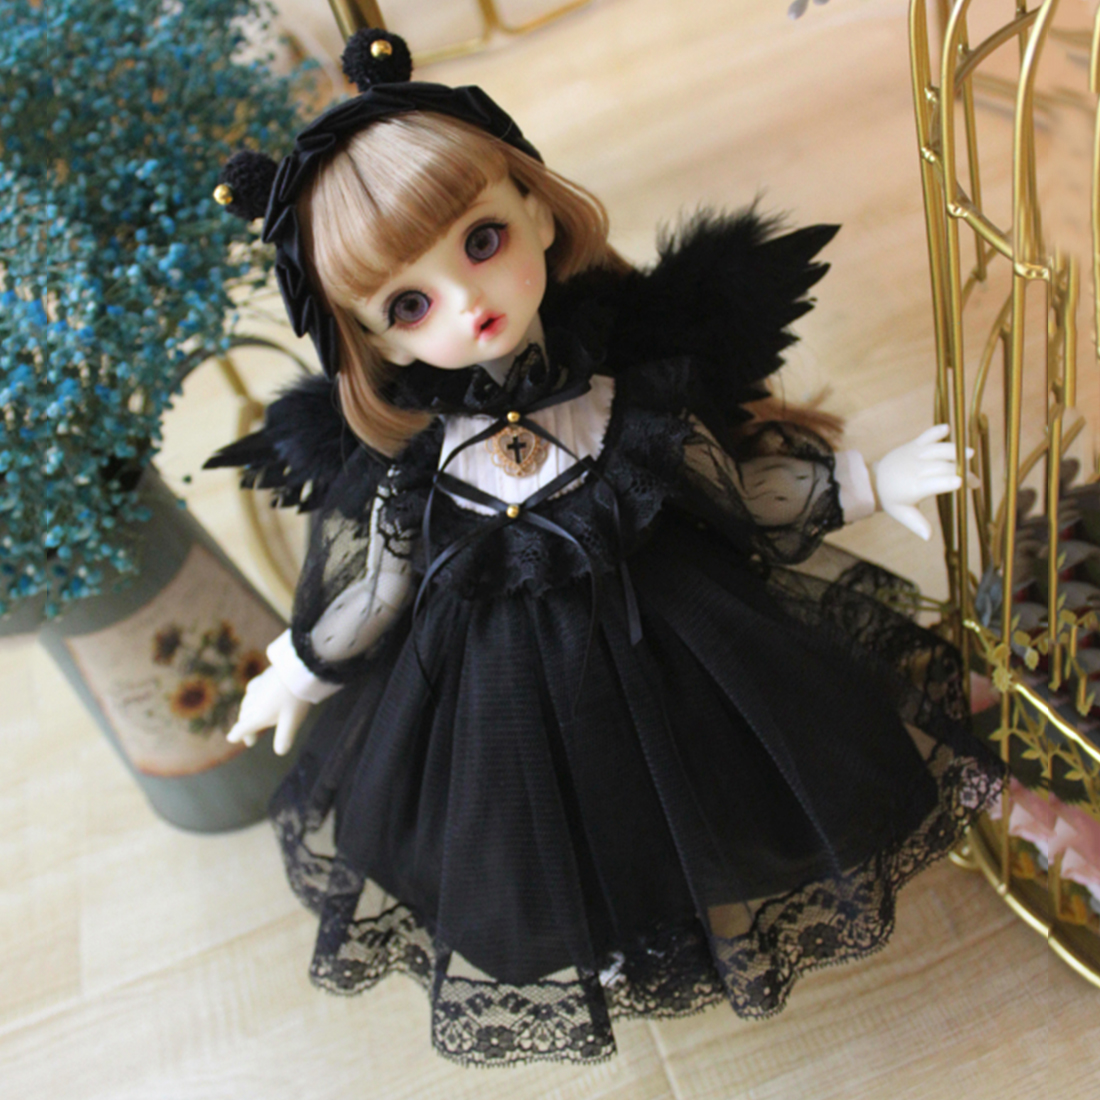 Modiker White Black Angel Clothes Set for 1/6 1/3  BJD Dolls Accessories - No Doll